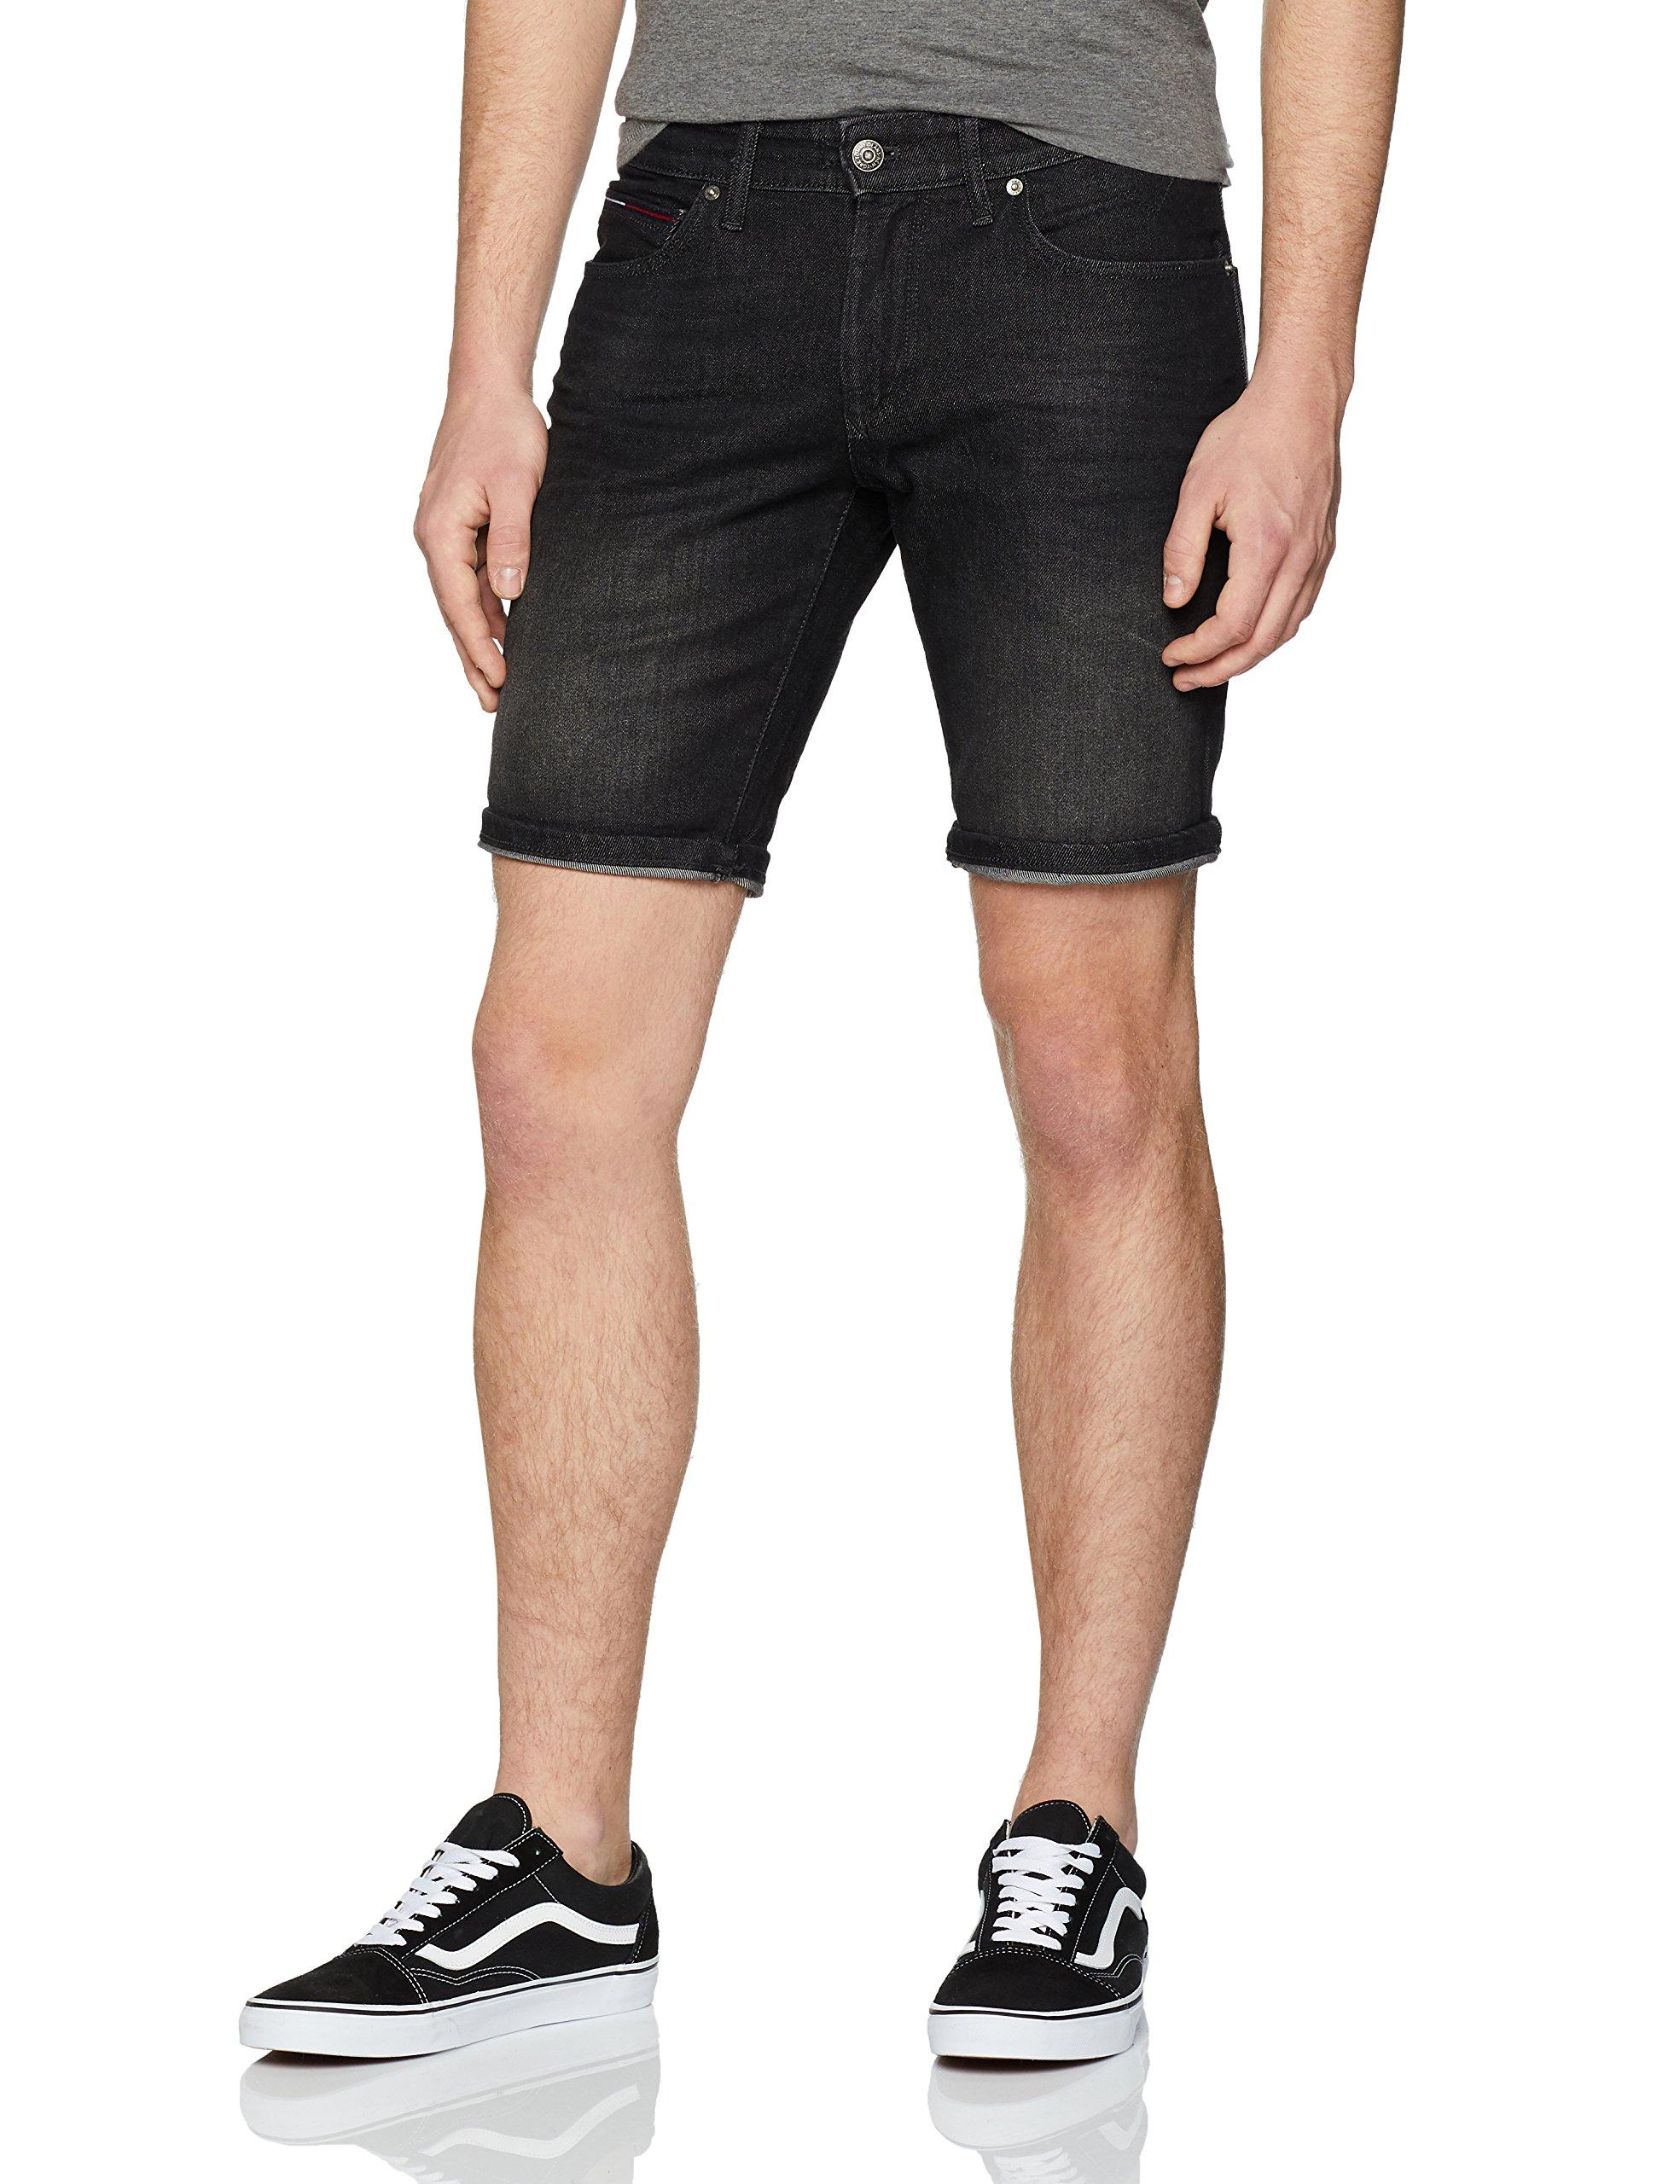 Skinny Short Comfort Jeans FabricantNi29 Bleuclassic Black Scanton Tommy Homme 911taille Ygvb7mI6yf